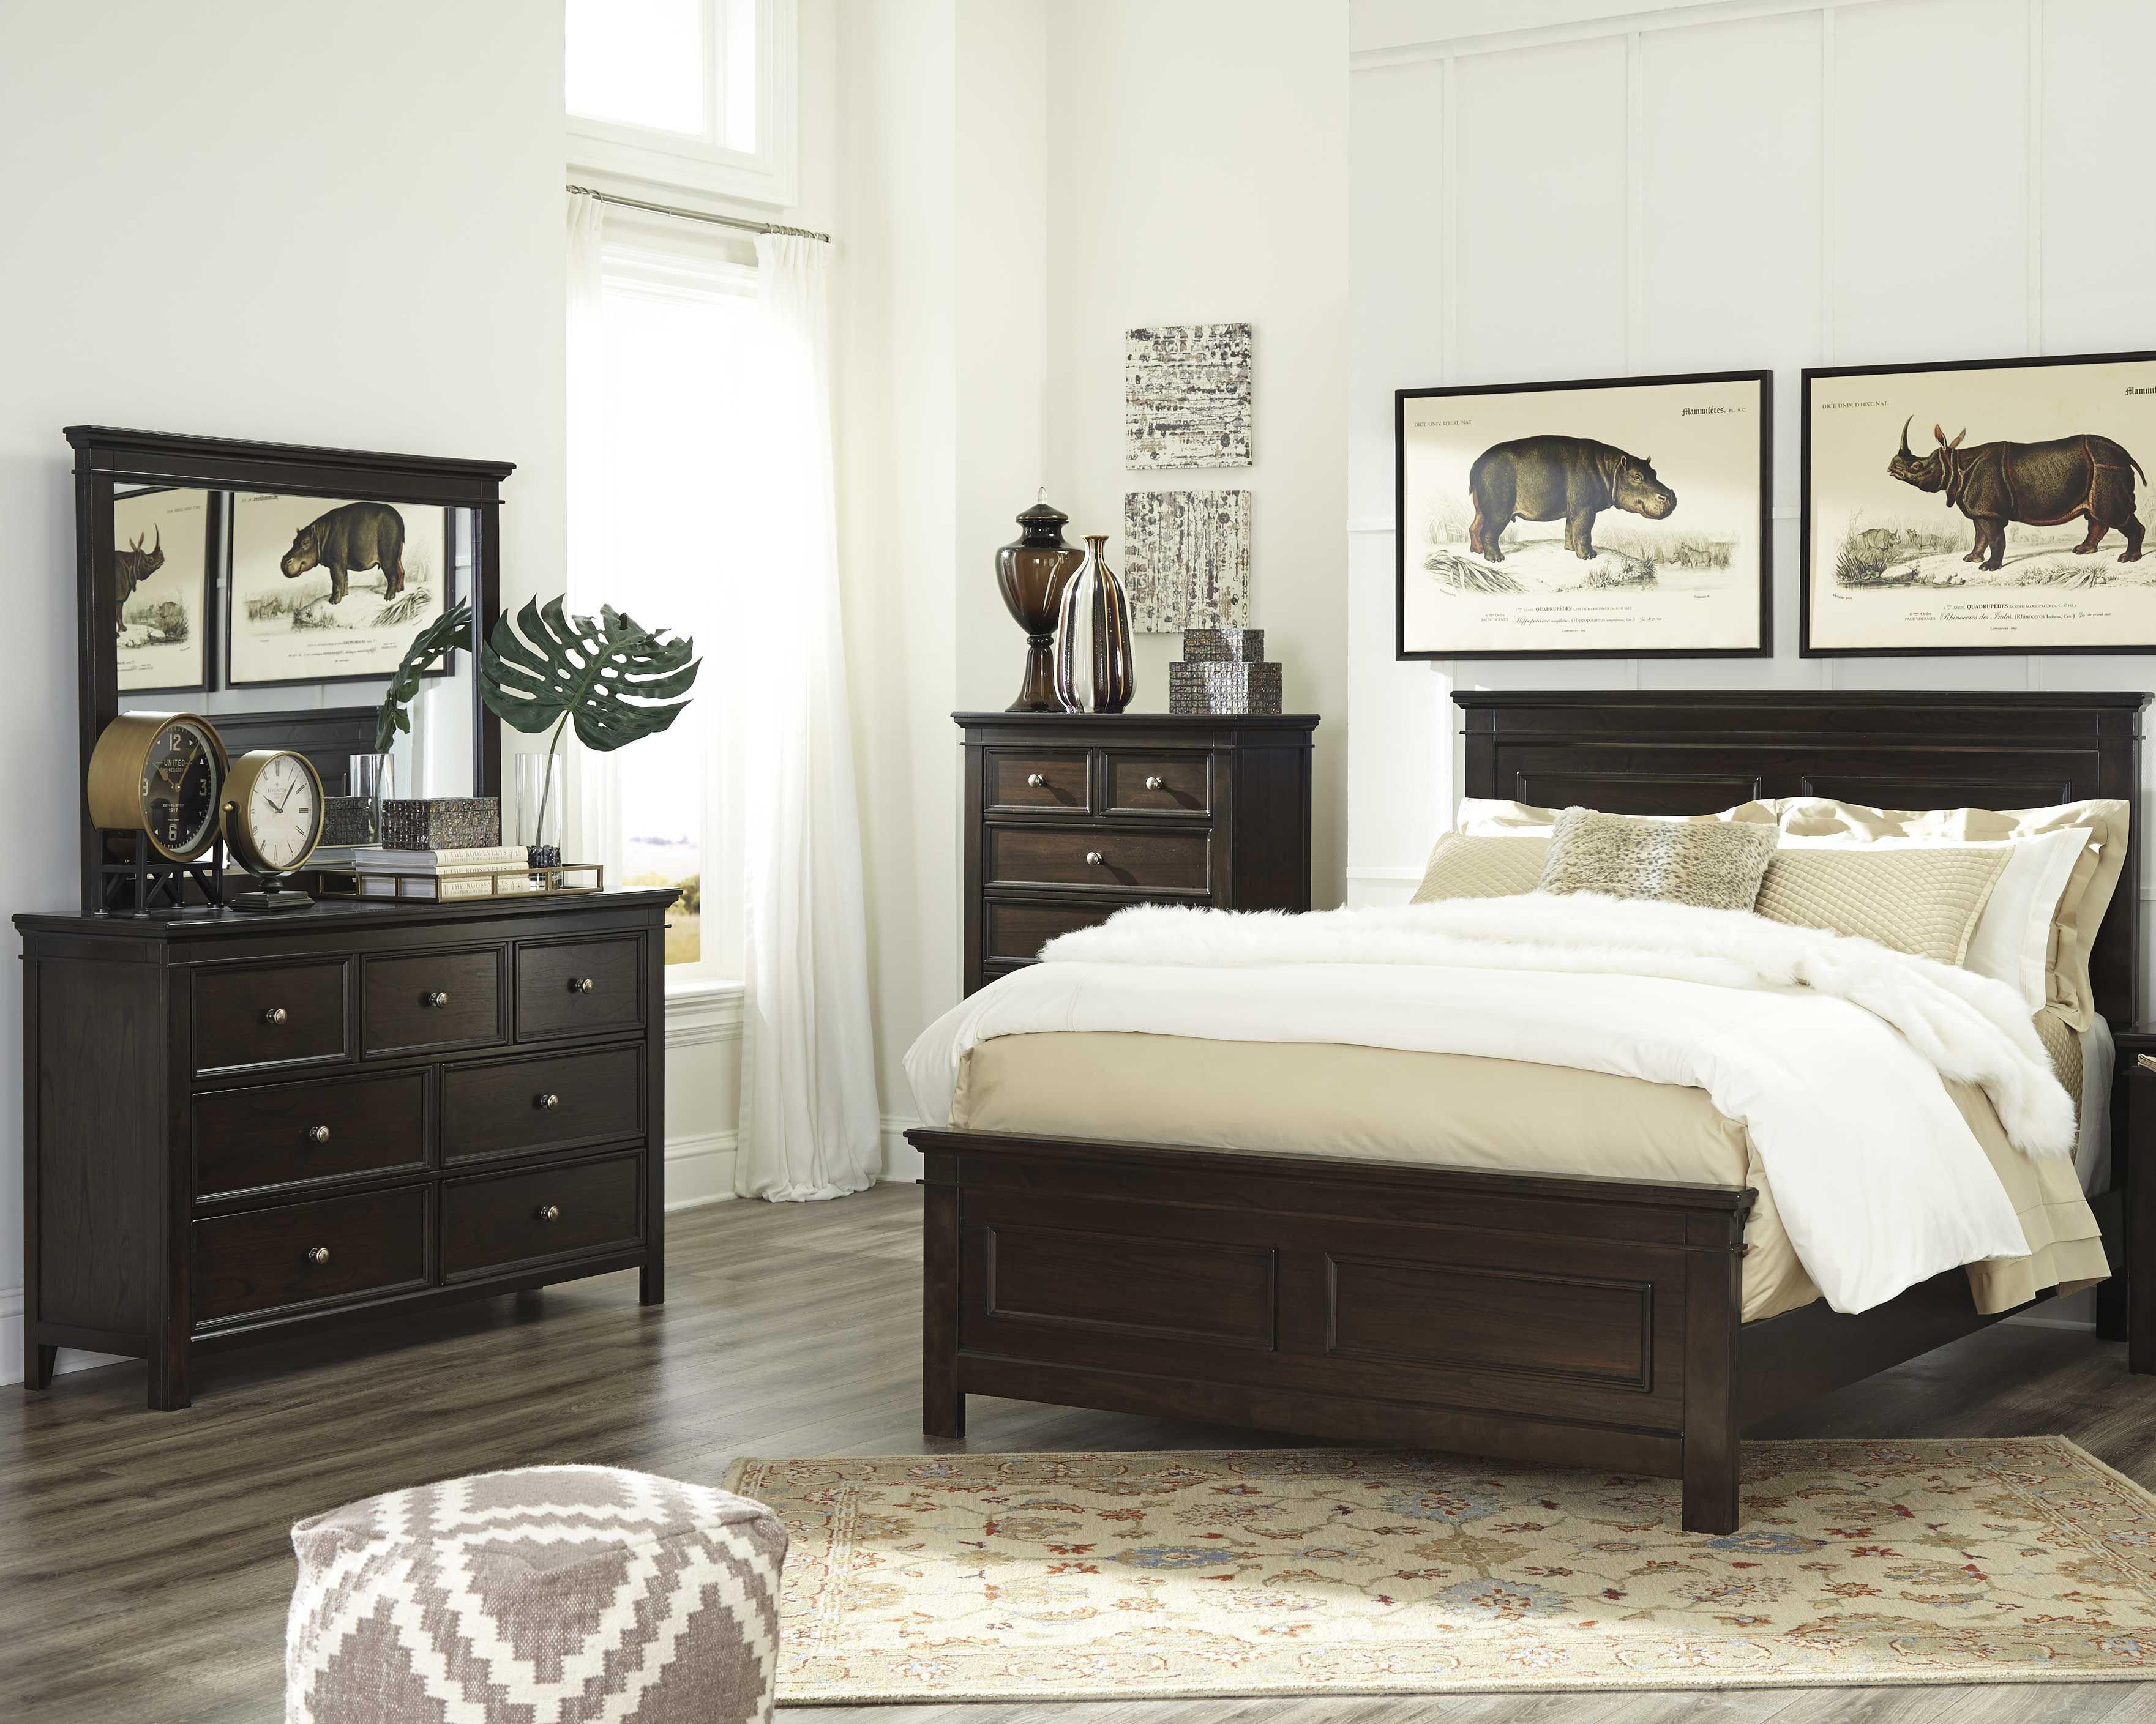 5 Piece Bedroom Set Awesome Alexee 5 Piece King Bedroom Dark Brown